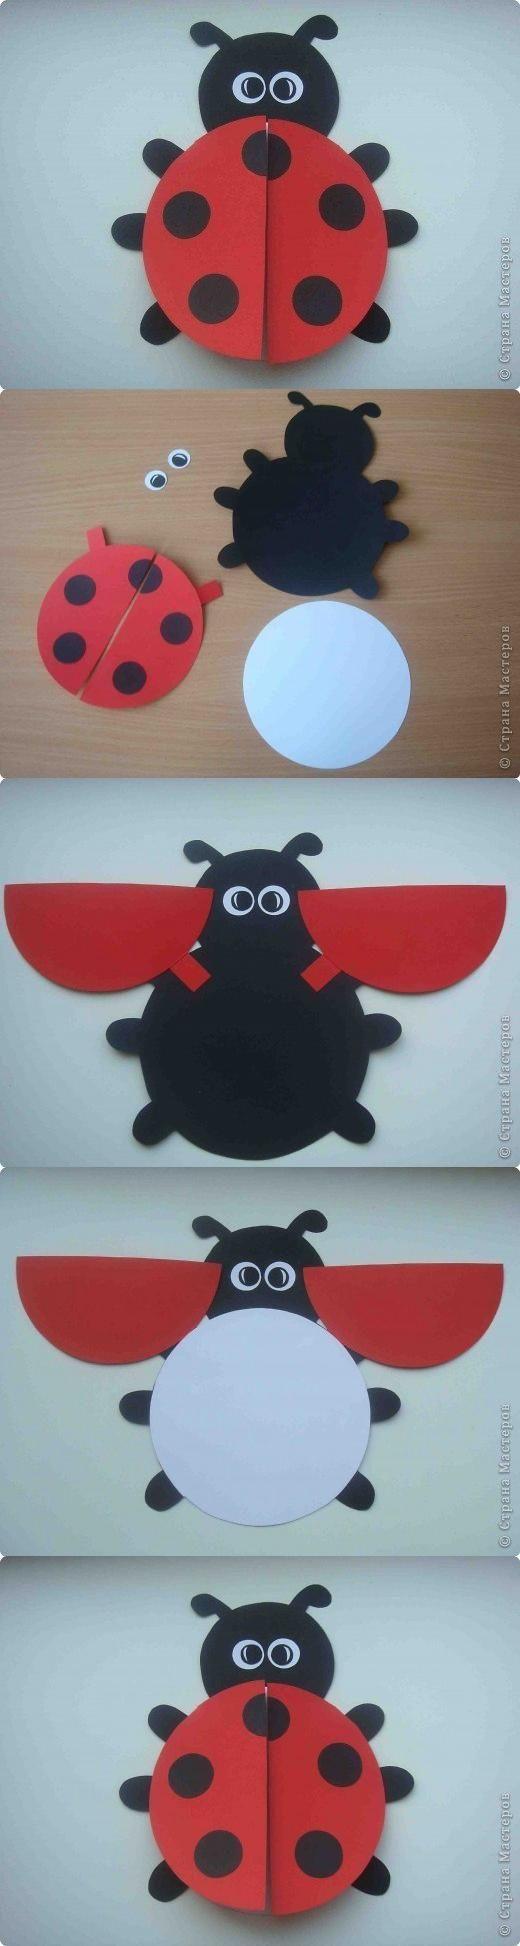 DIY Ladybug Postcard | card ideas | Pinterest | Catarina, Mariquita ...